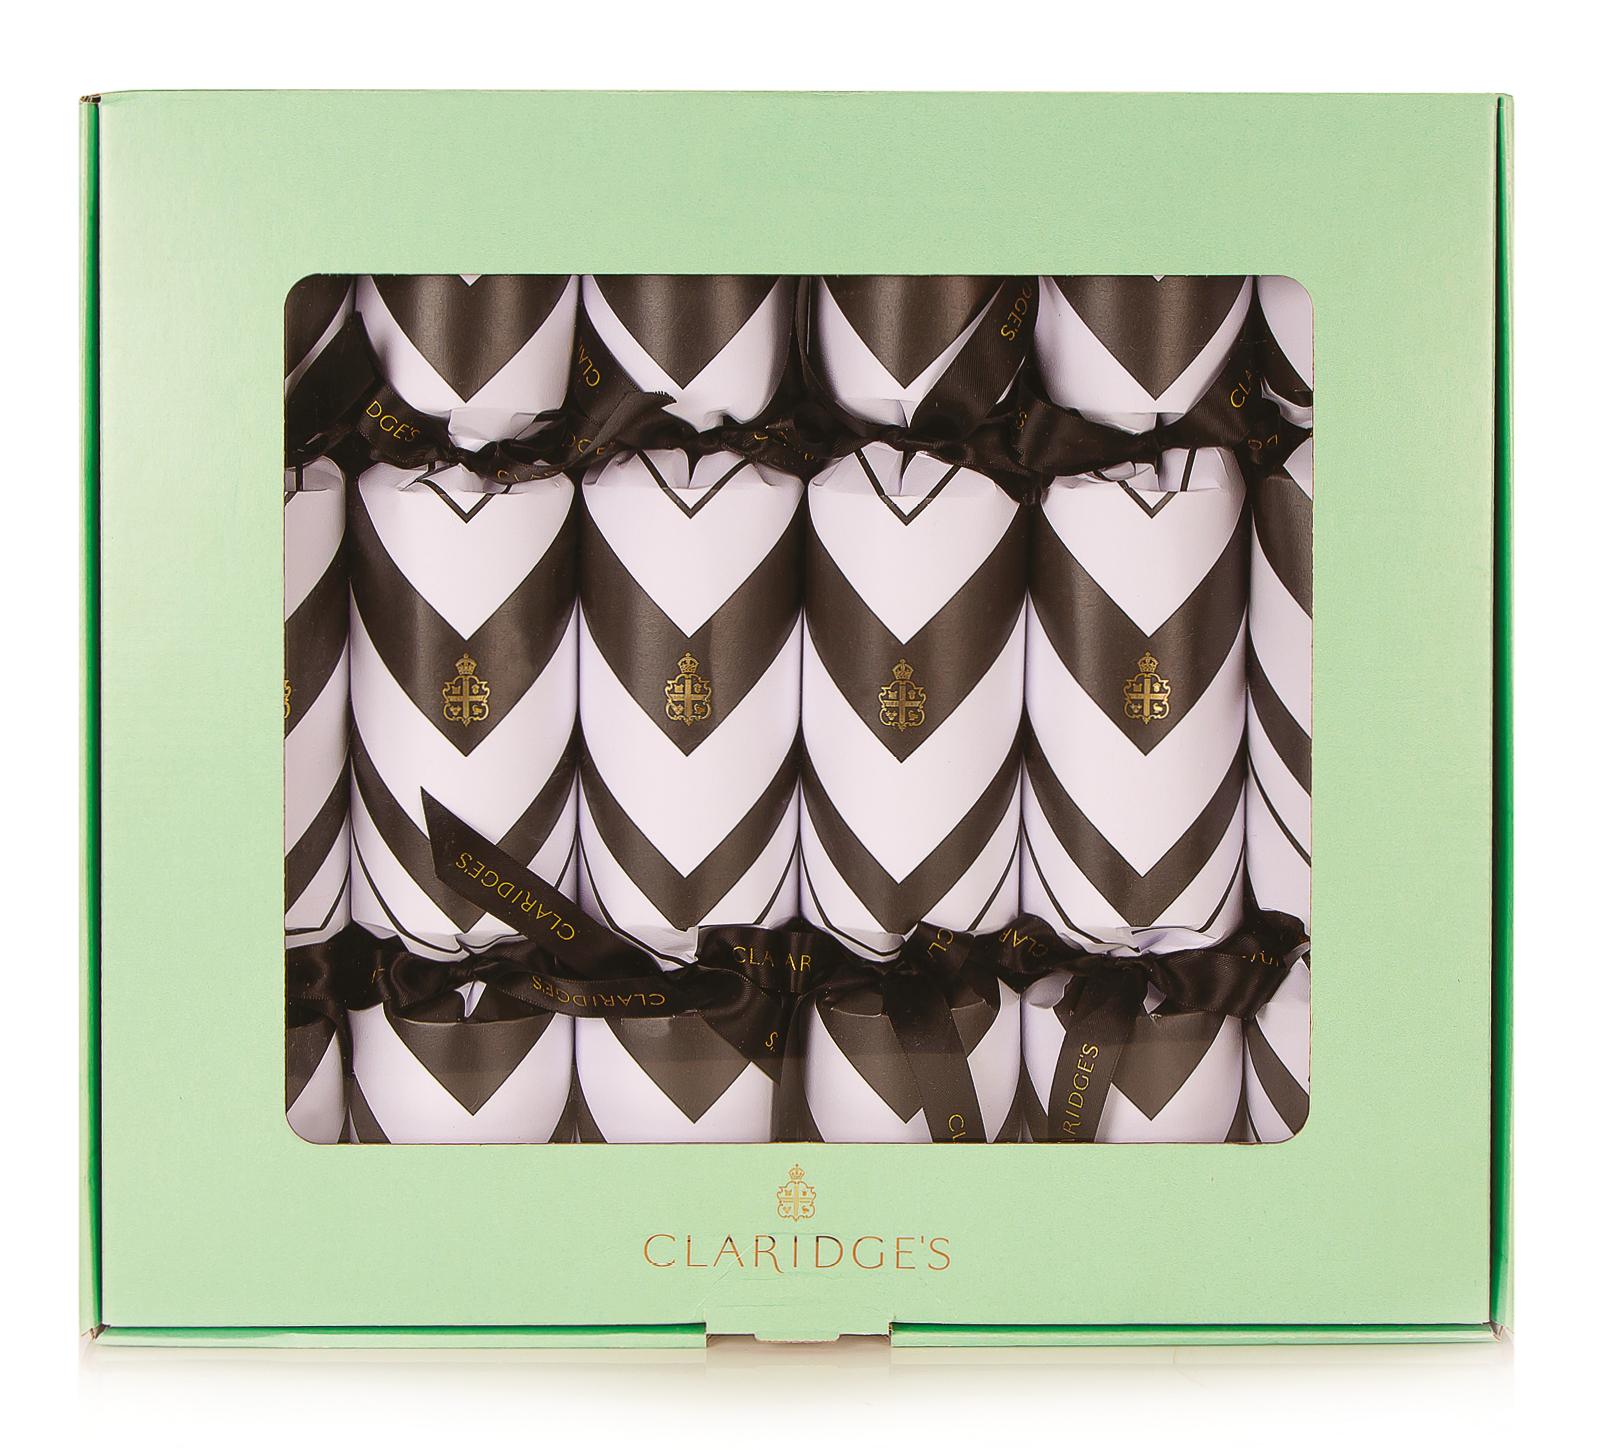 Claridges Hotel Christmas Cracker featuring iconic chevron print design